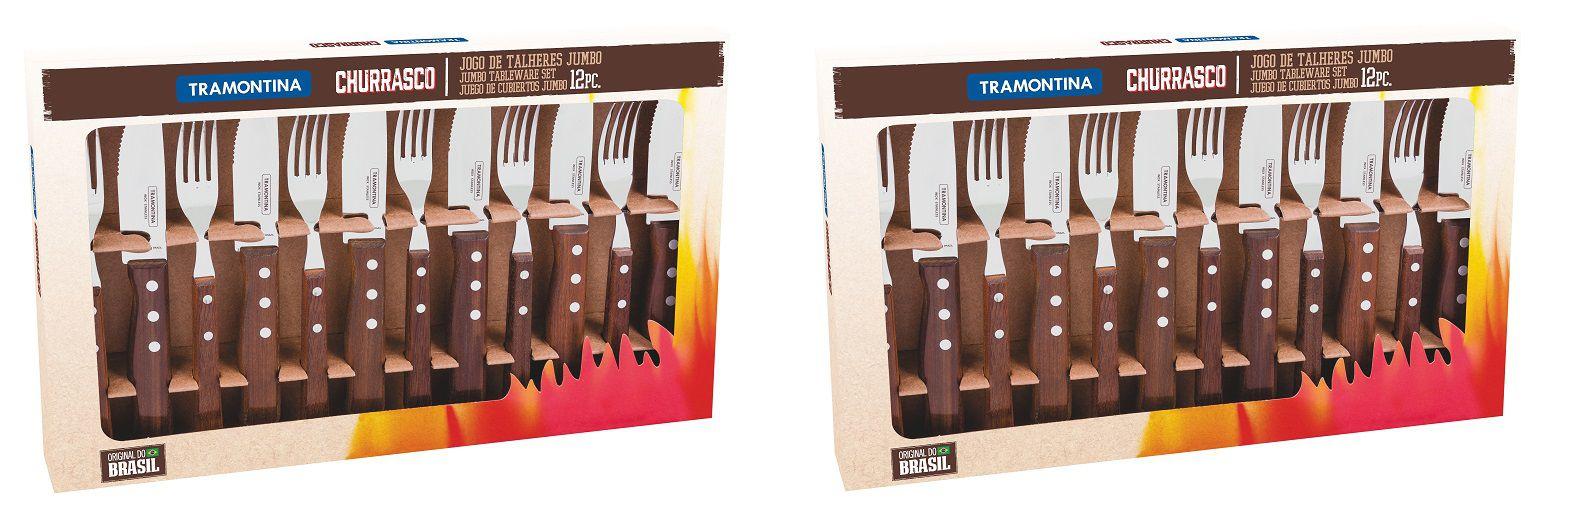 Kit Churrasco 24 Peças Jumbo Tramontina Garfo Faca 22299/059